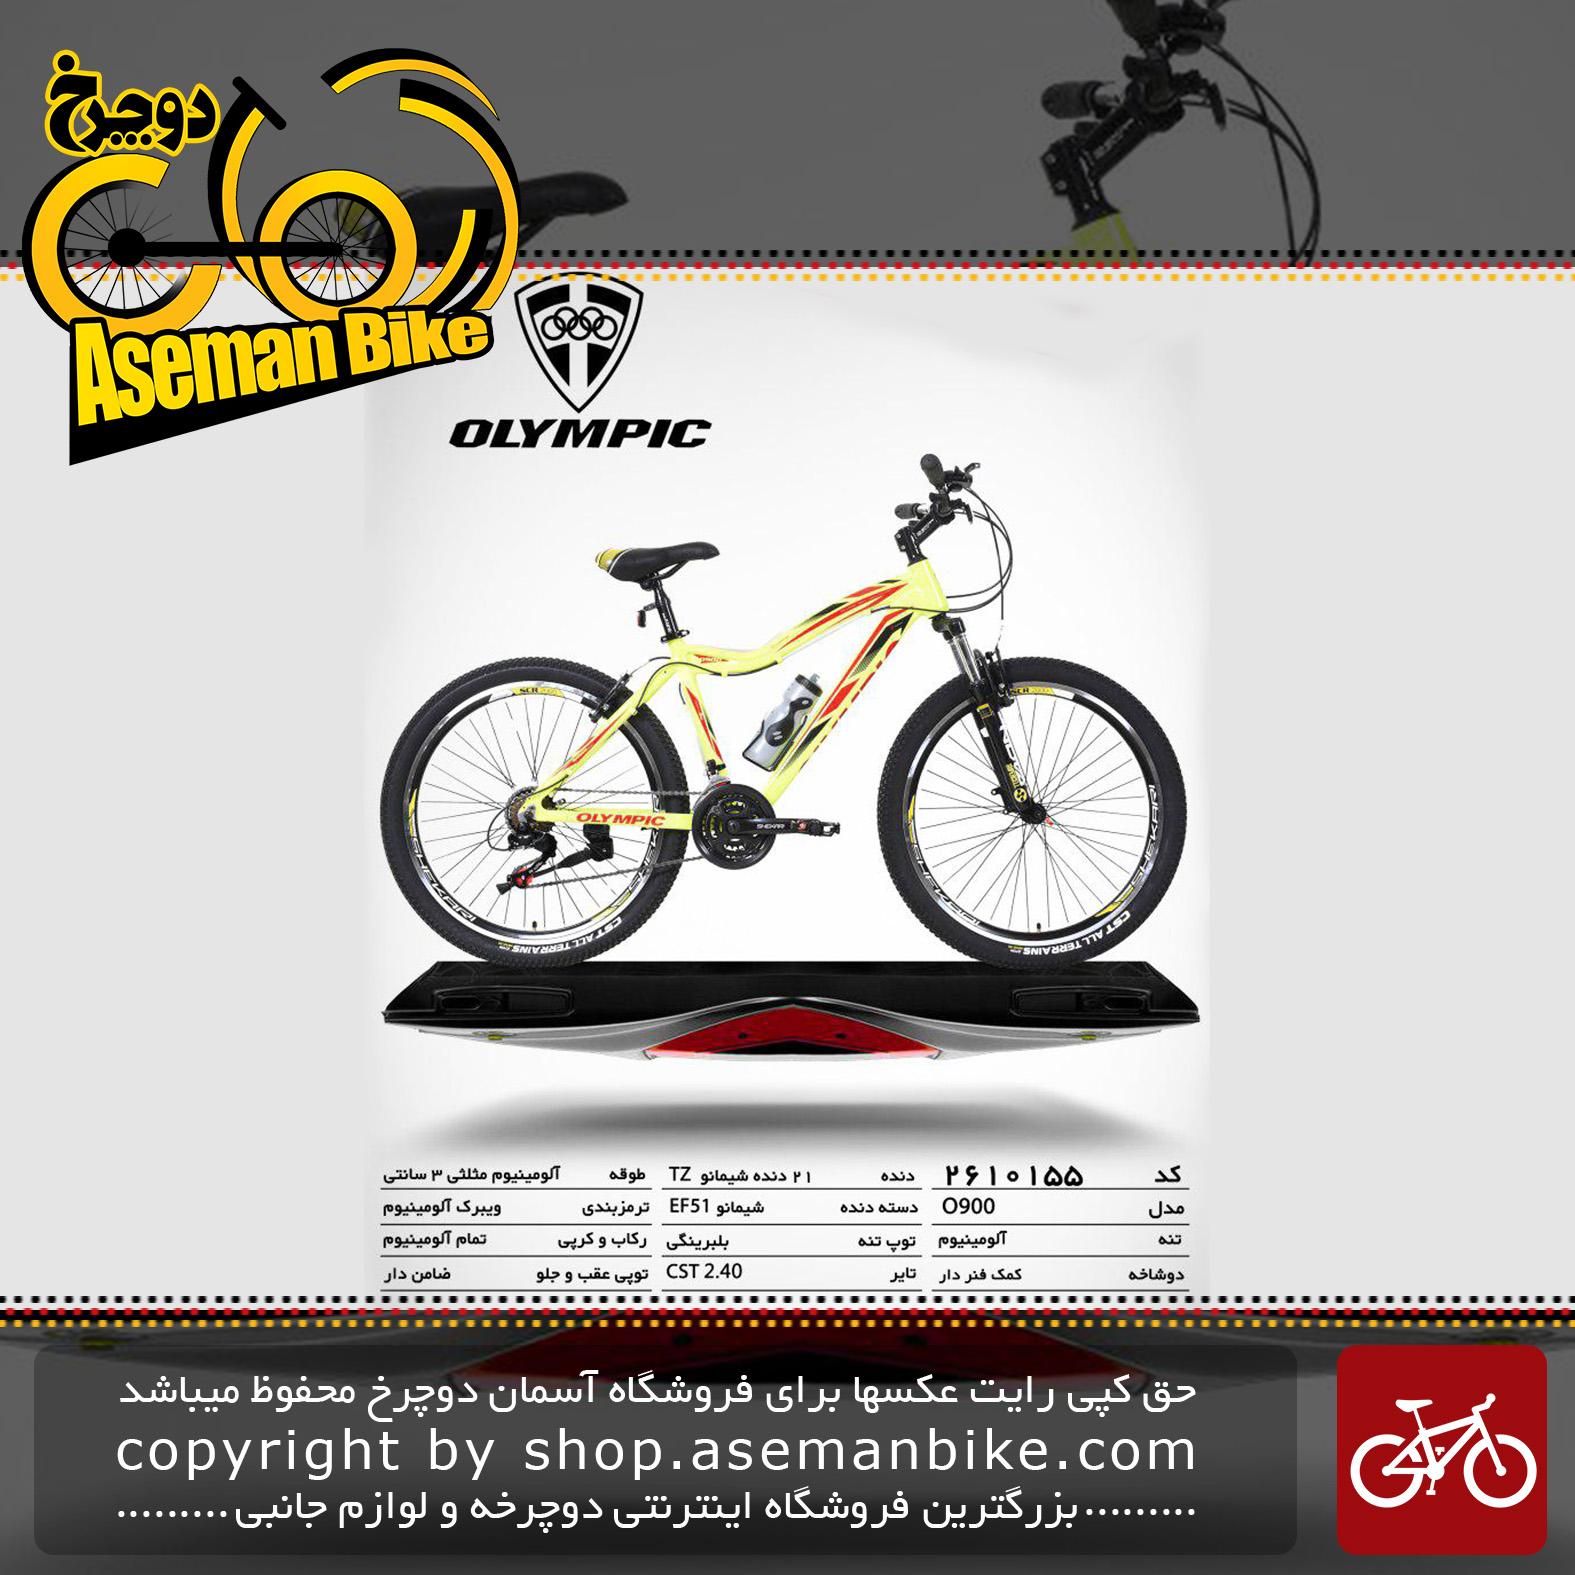 دوچرخه کوهستان شهری المپیک 21 دنده مدل او 900 سایز 26 ساخت تایوان OLYMPIC Mountain City Bicycle Taiwan O900 Size 26 2019